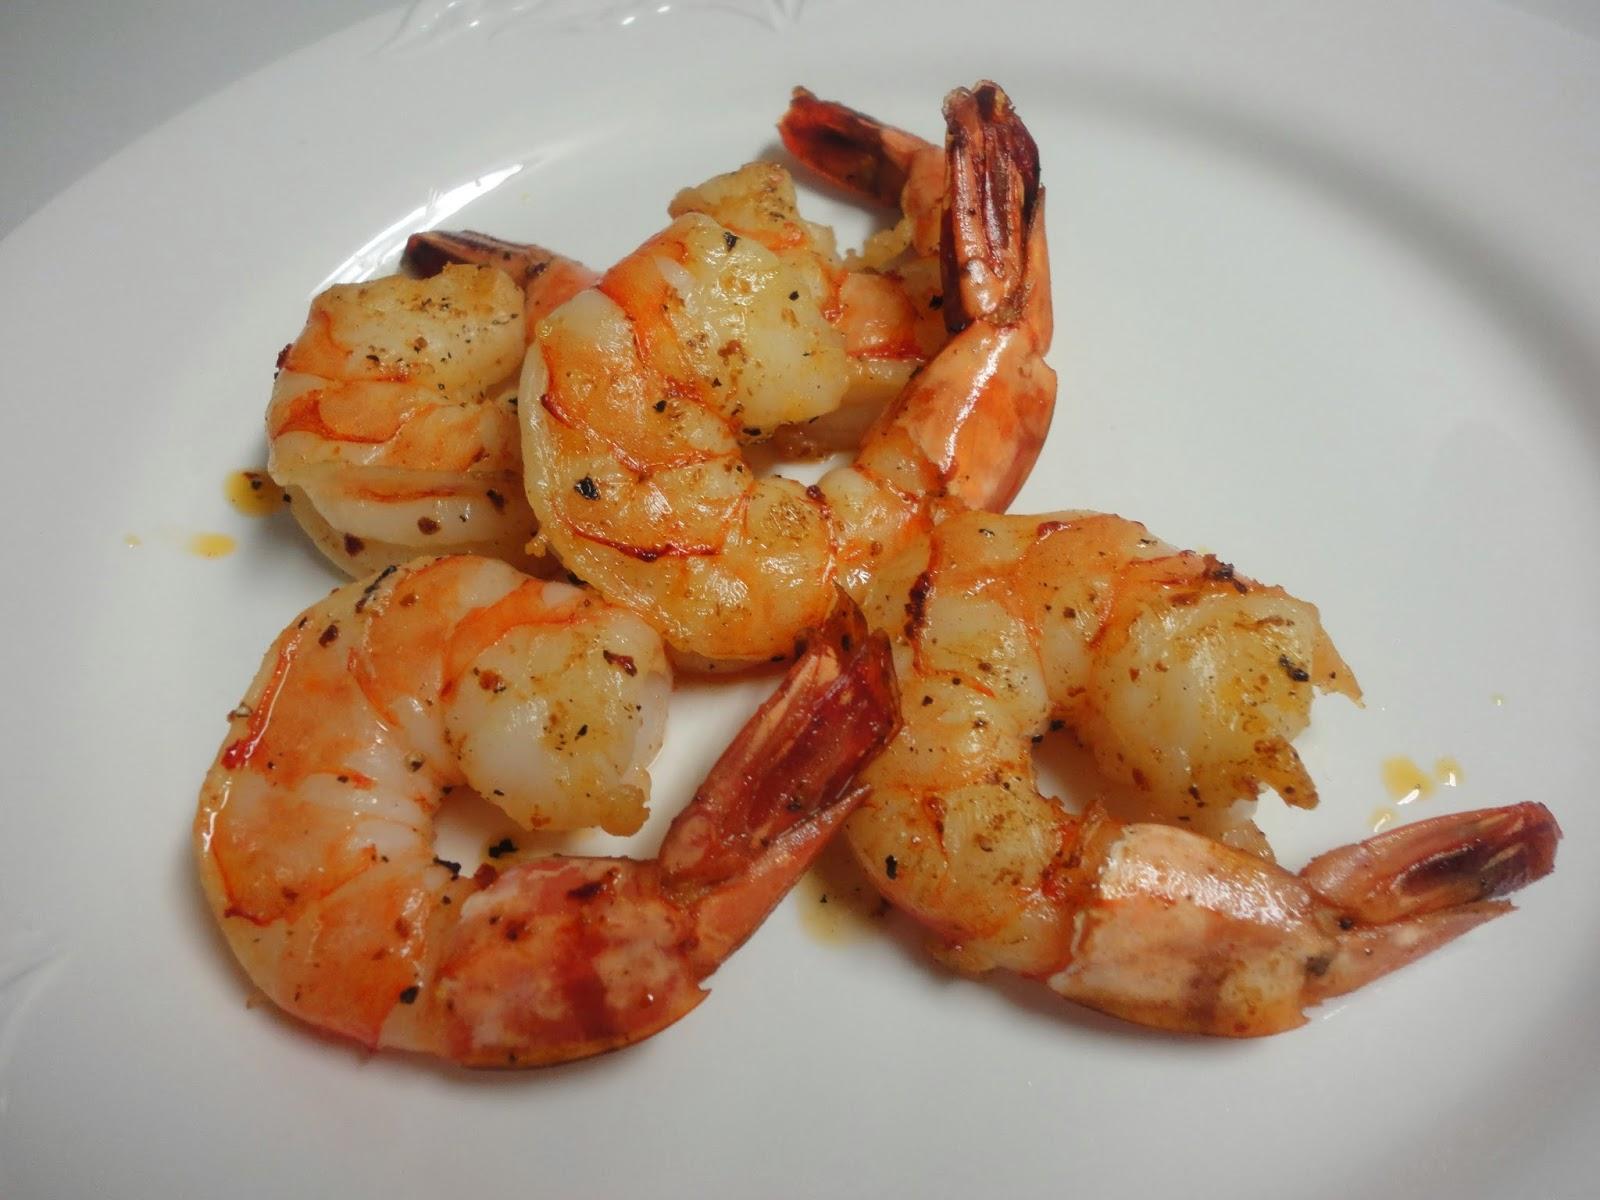 Shrimp, Corn and Avocado Quesadillas and Ina Garten's recipe for